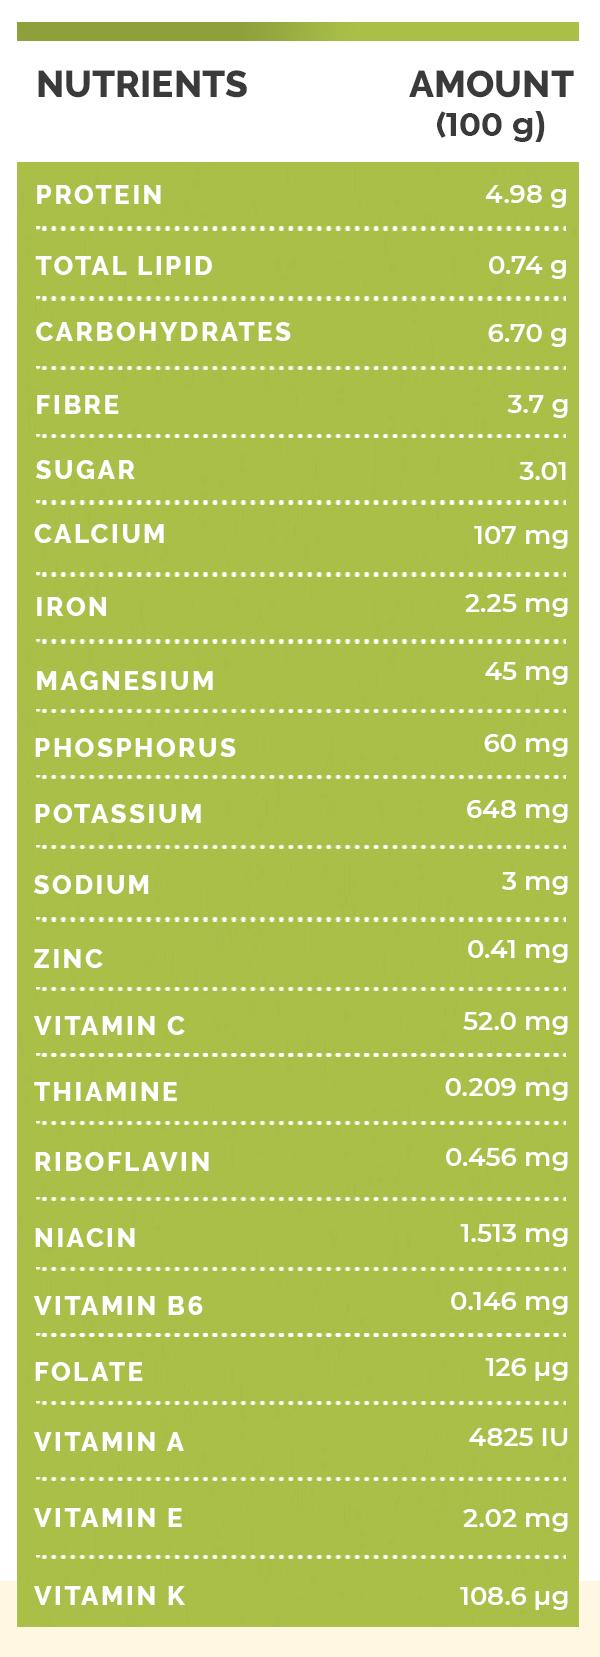 Listi Colocasia (listi Taro): Prehrana, koristi za zdravje in kako jesti